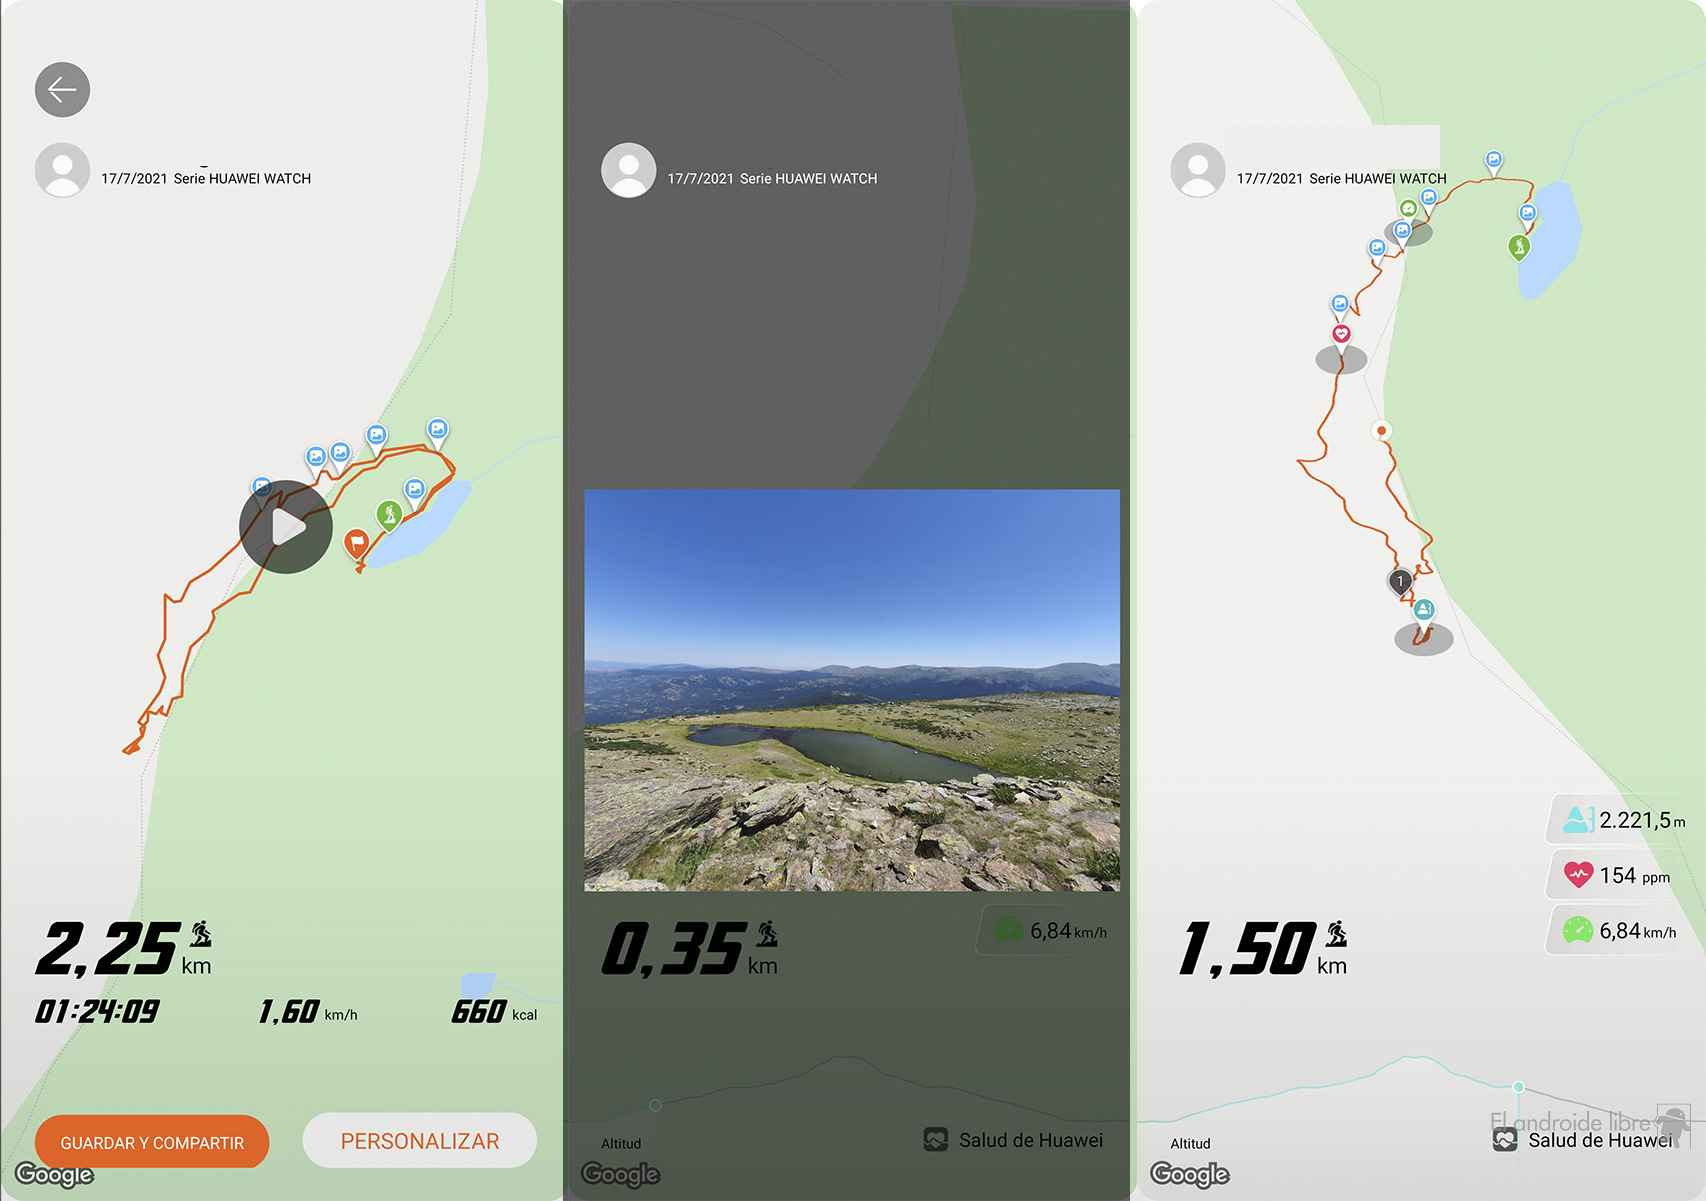 Seguimiento dinámico de la app Salud de Huawei